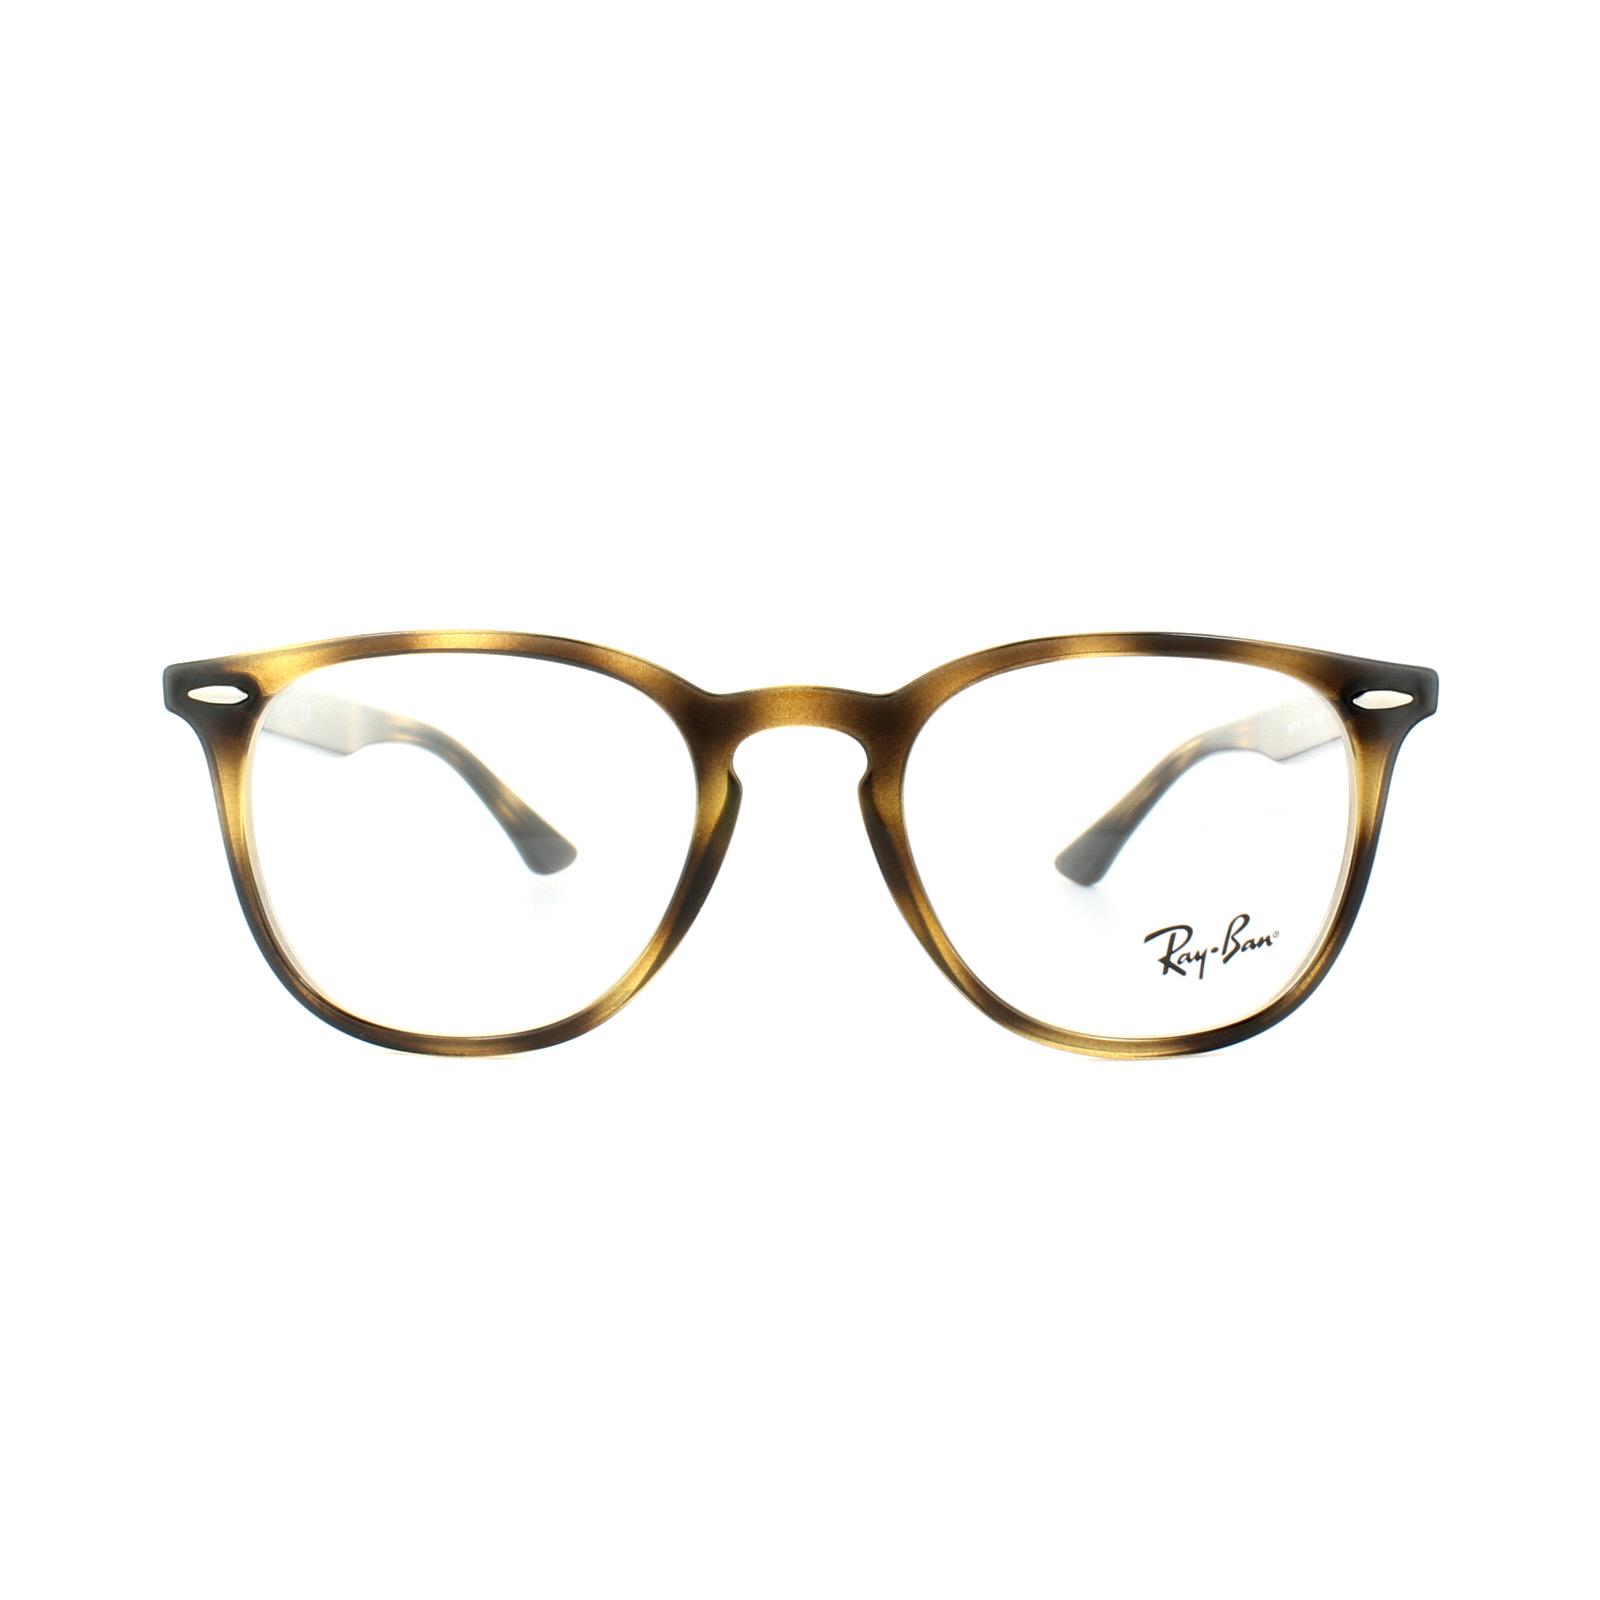 f6aa695cd82 Sentinel Ray-Ban Glasses Frames 7159 2012 Havana Mens Womens 50mm